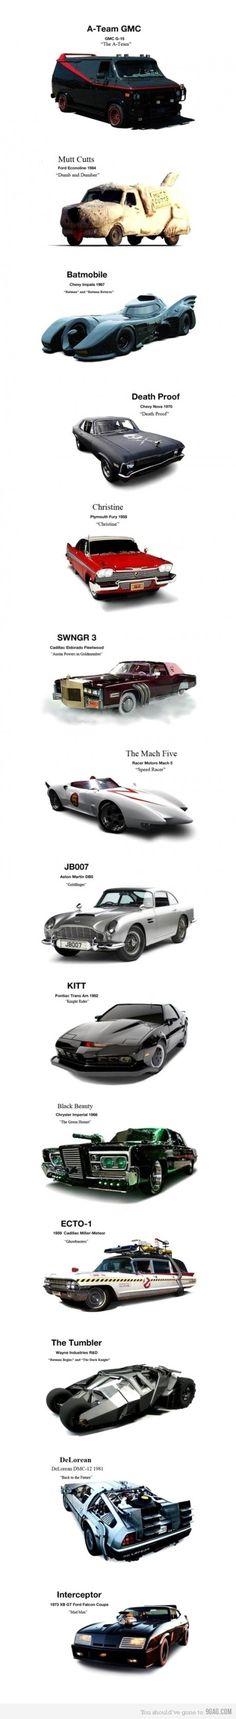 Movie cars...cool